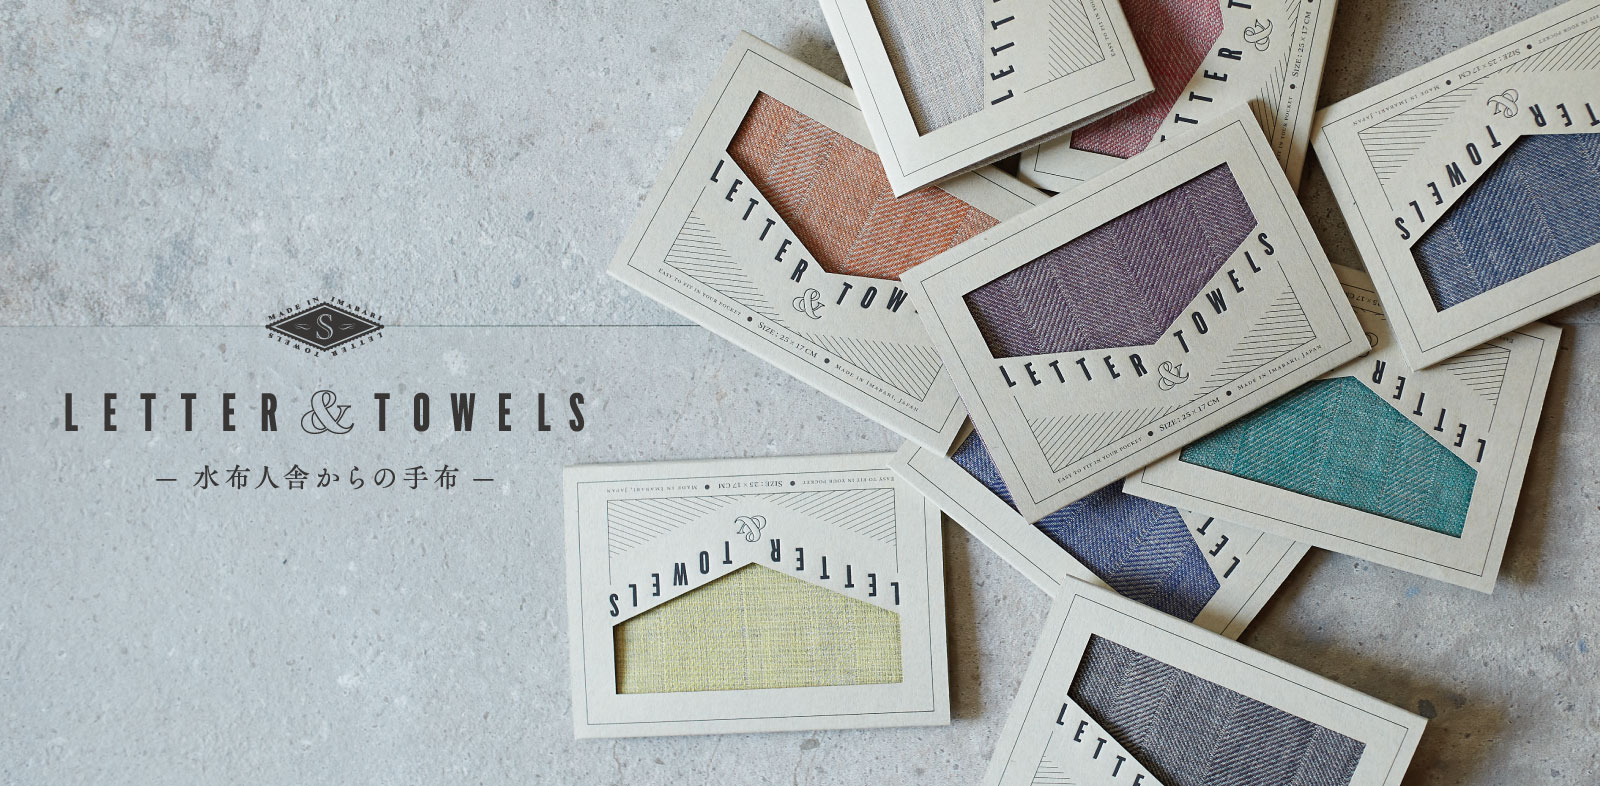 letter&towels 画像